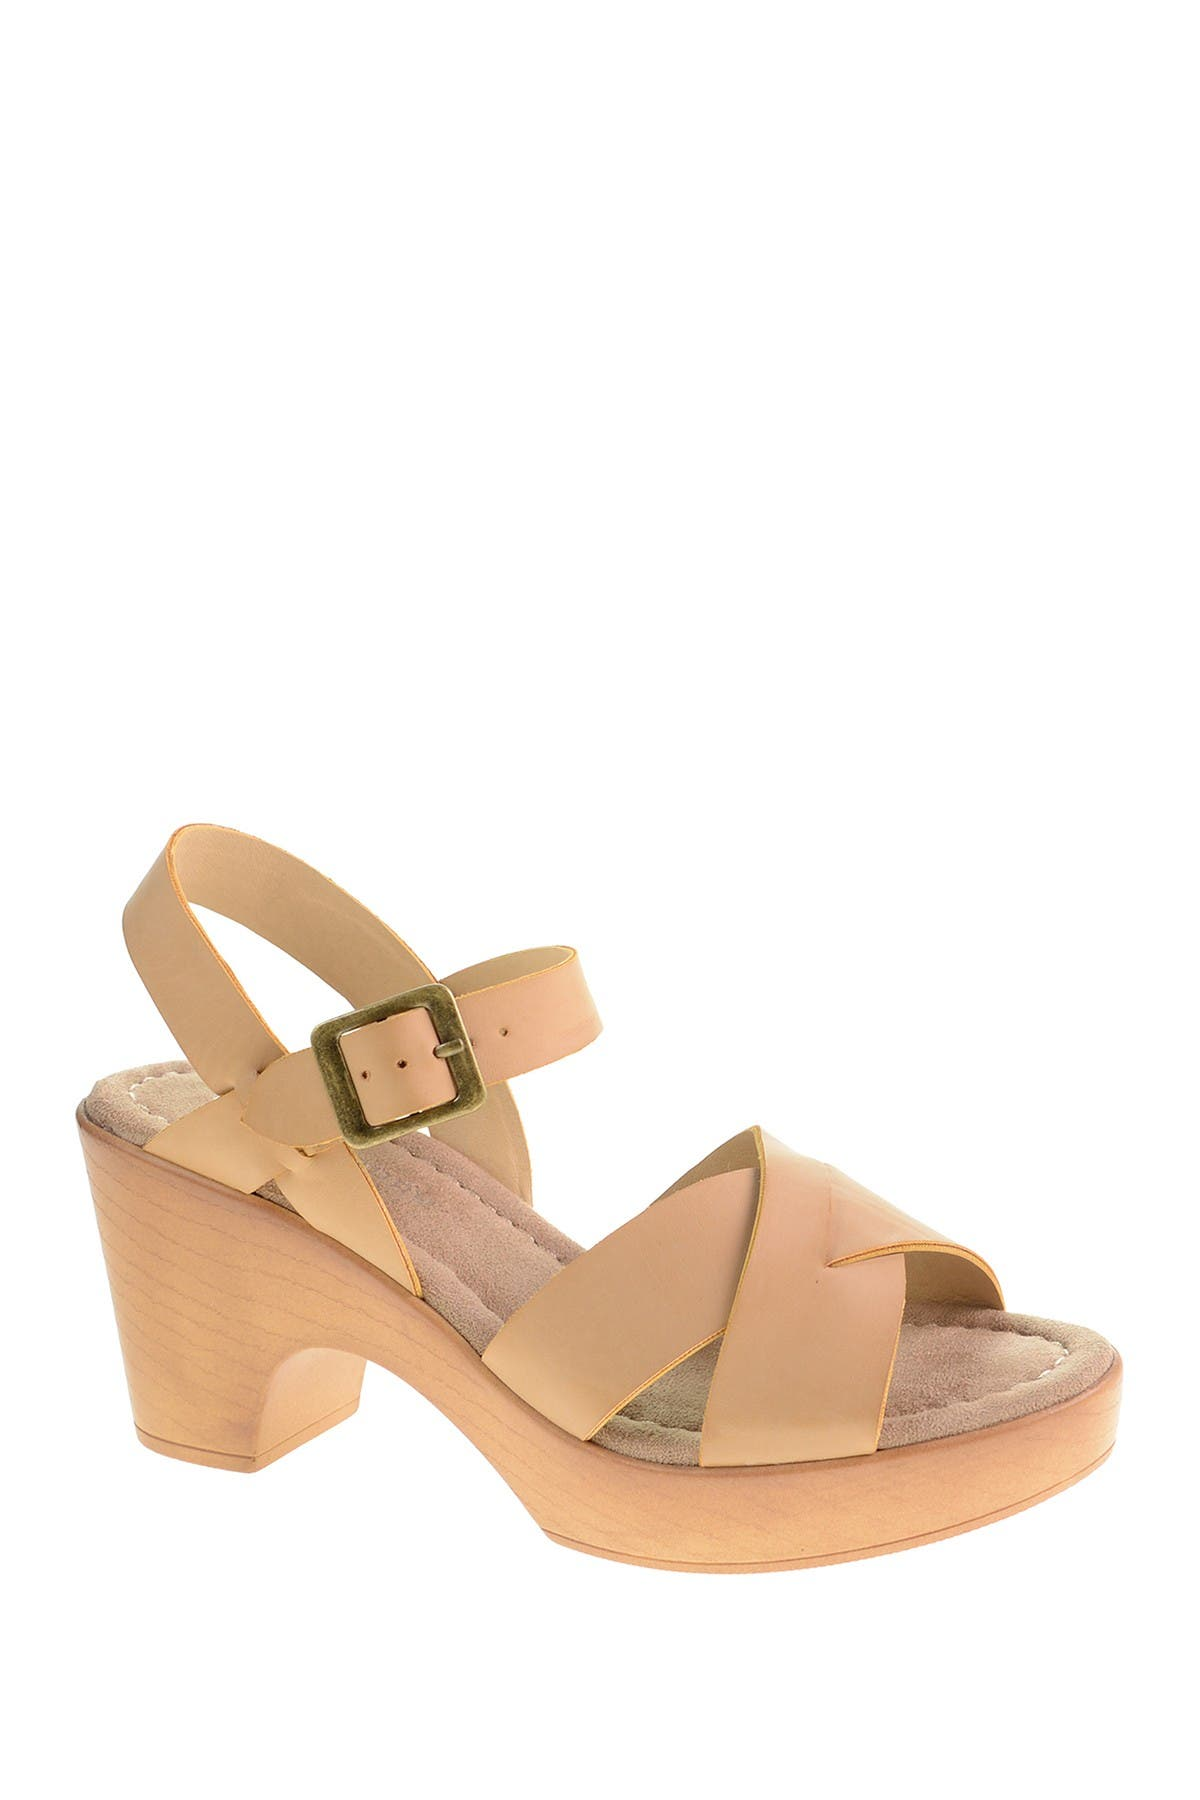 Image of CL by Laundry Amiya Platform Sandal